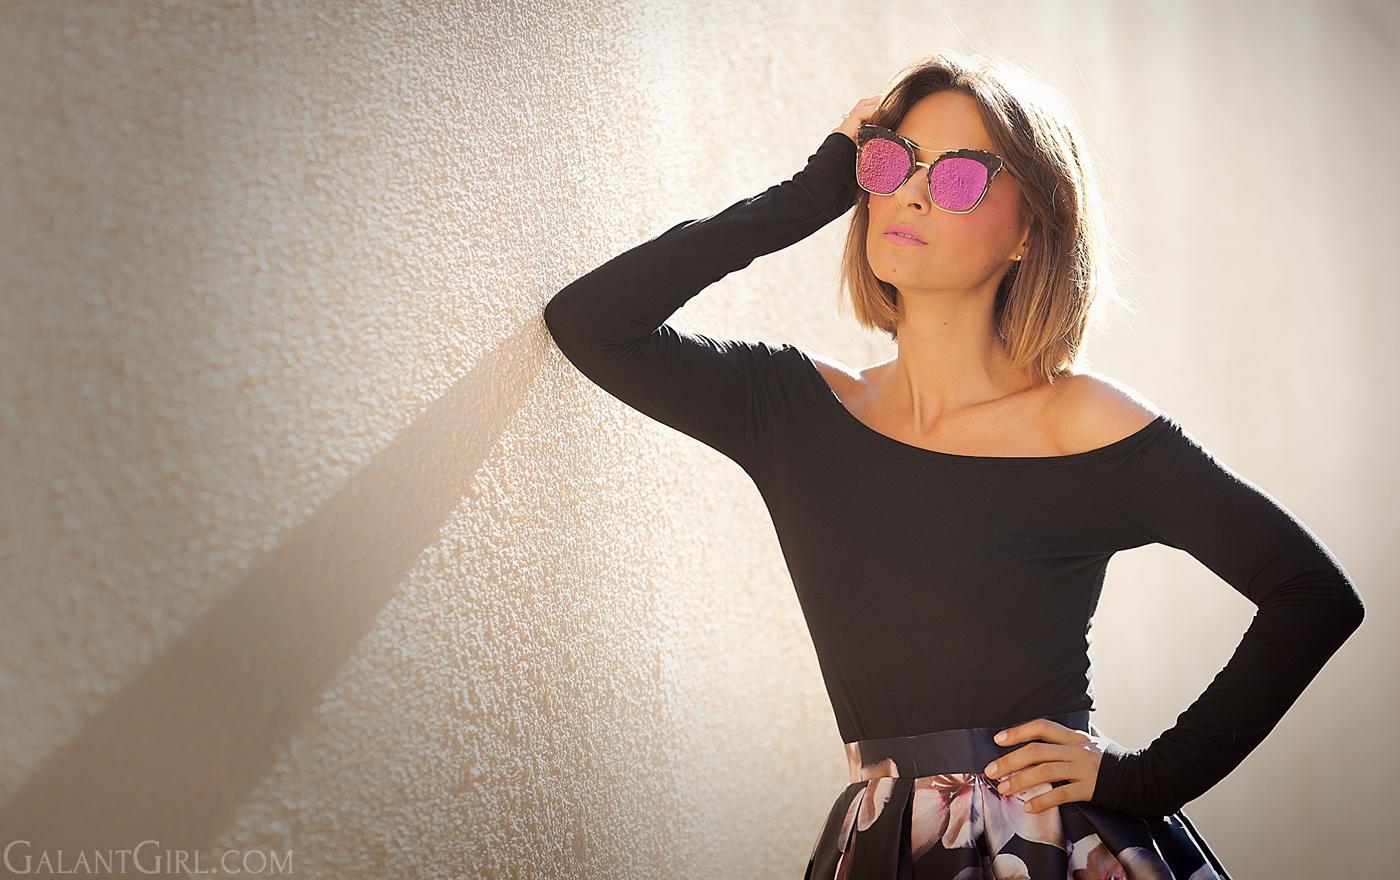 gentle-monster-eyewear-by-fashion-blogger-galant-girl